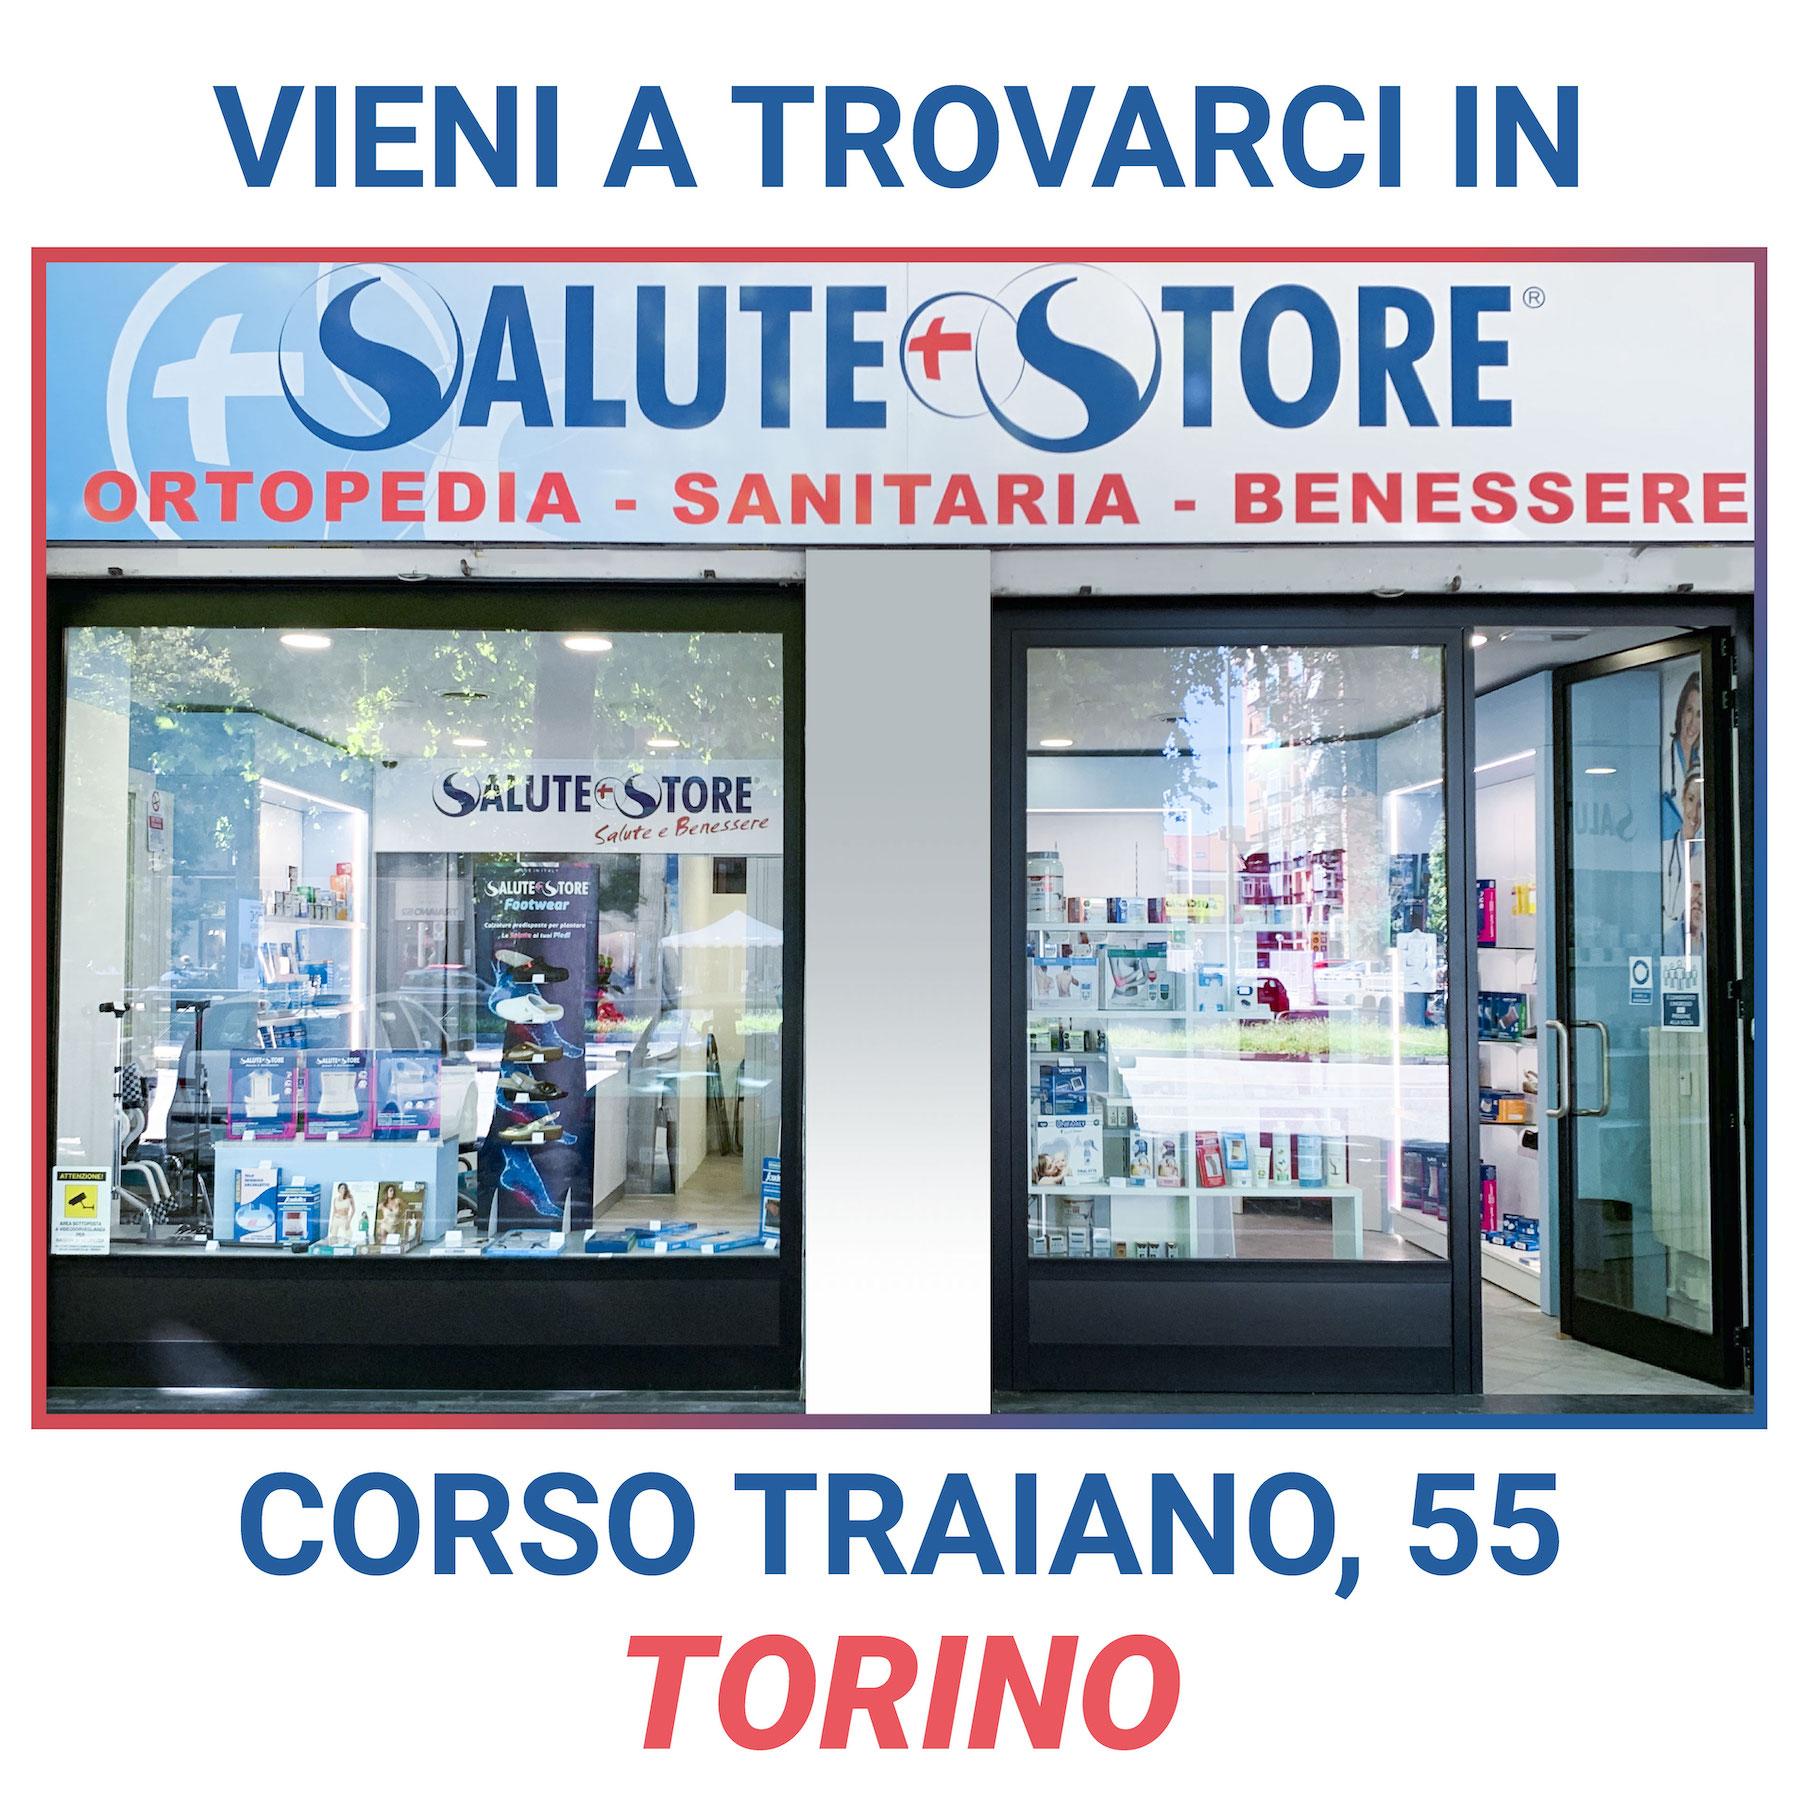 Salute Store Torino To Salute Store